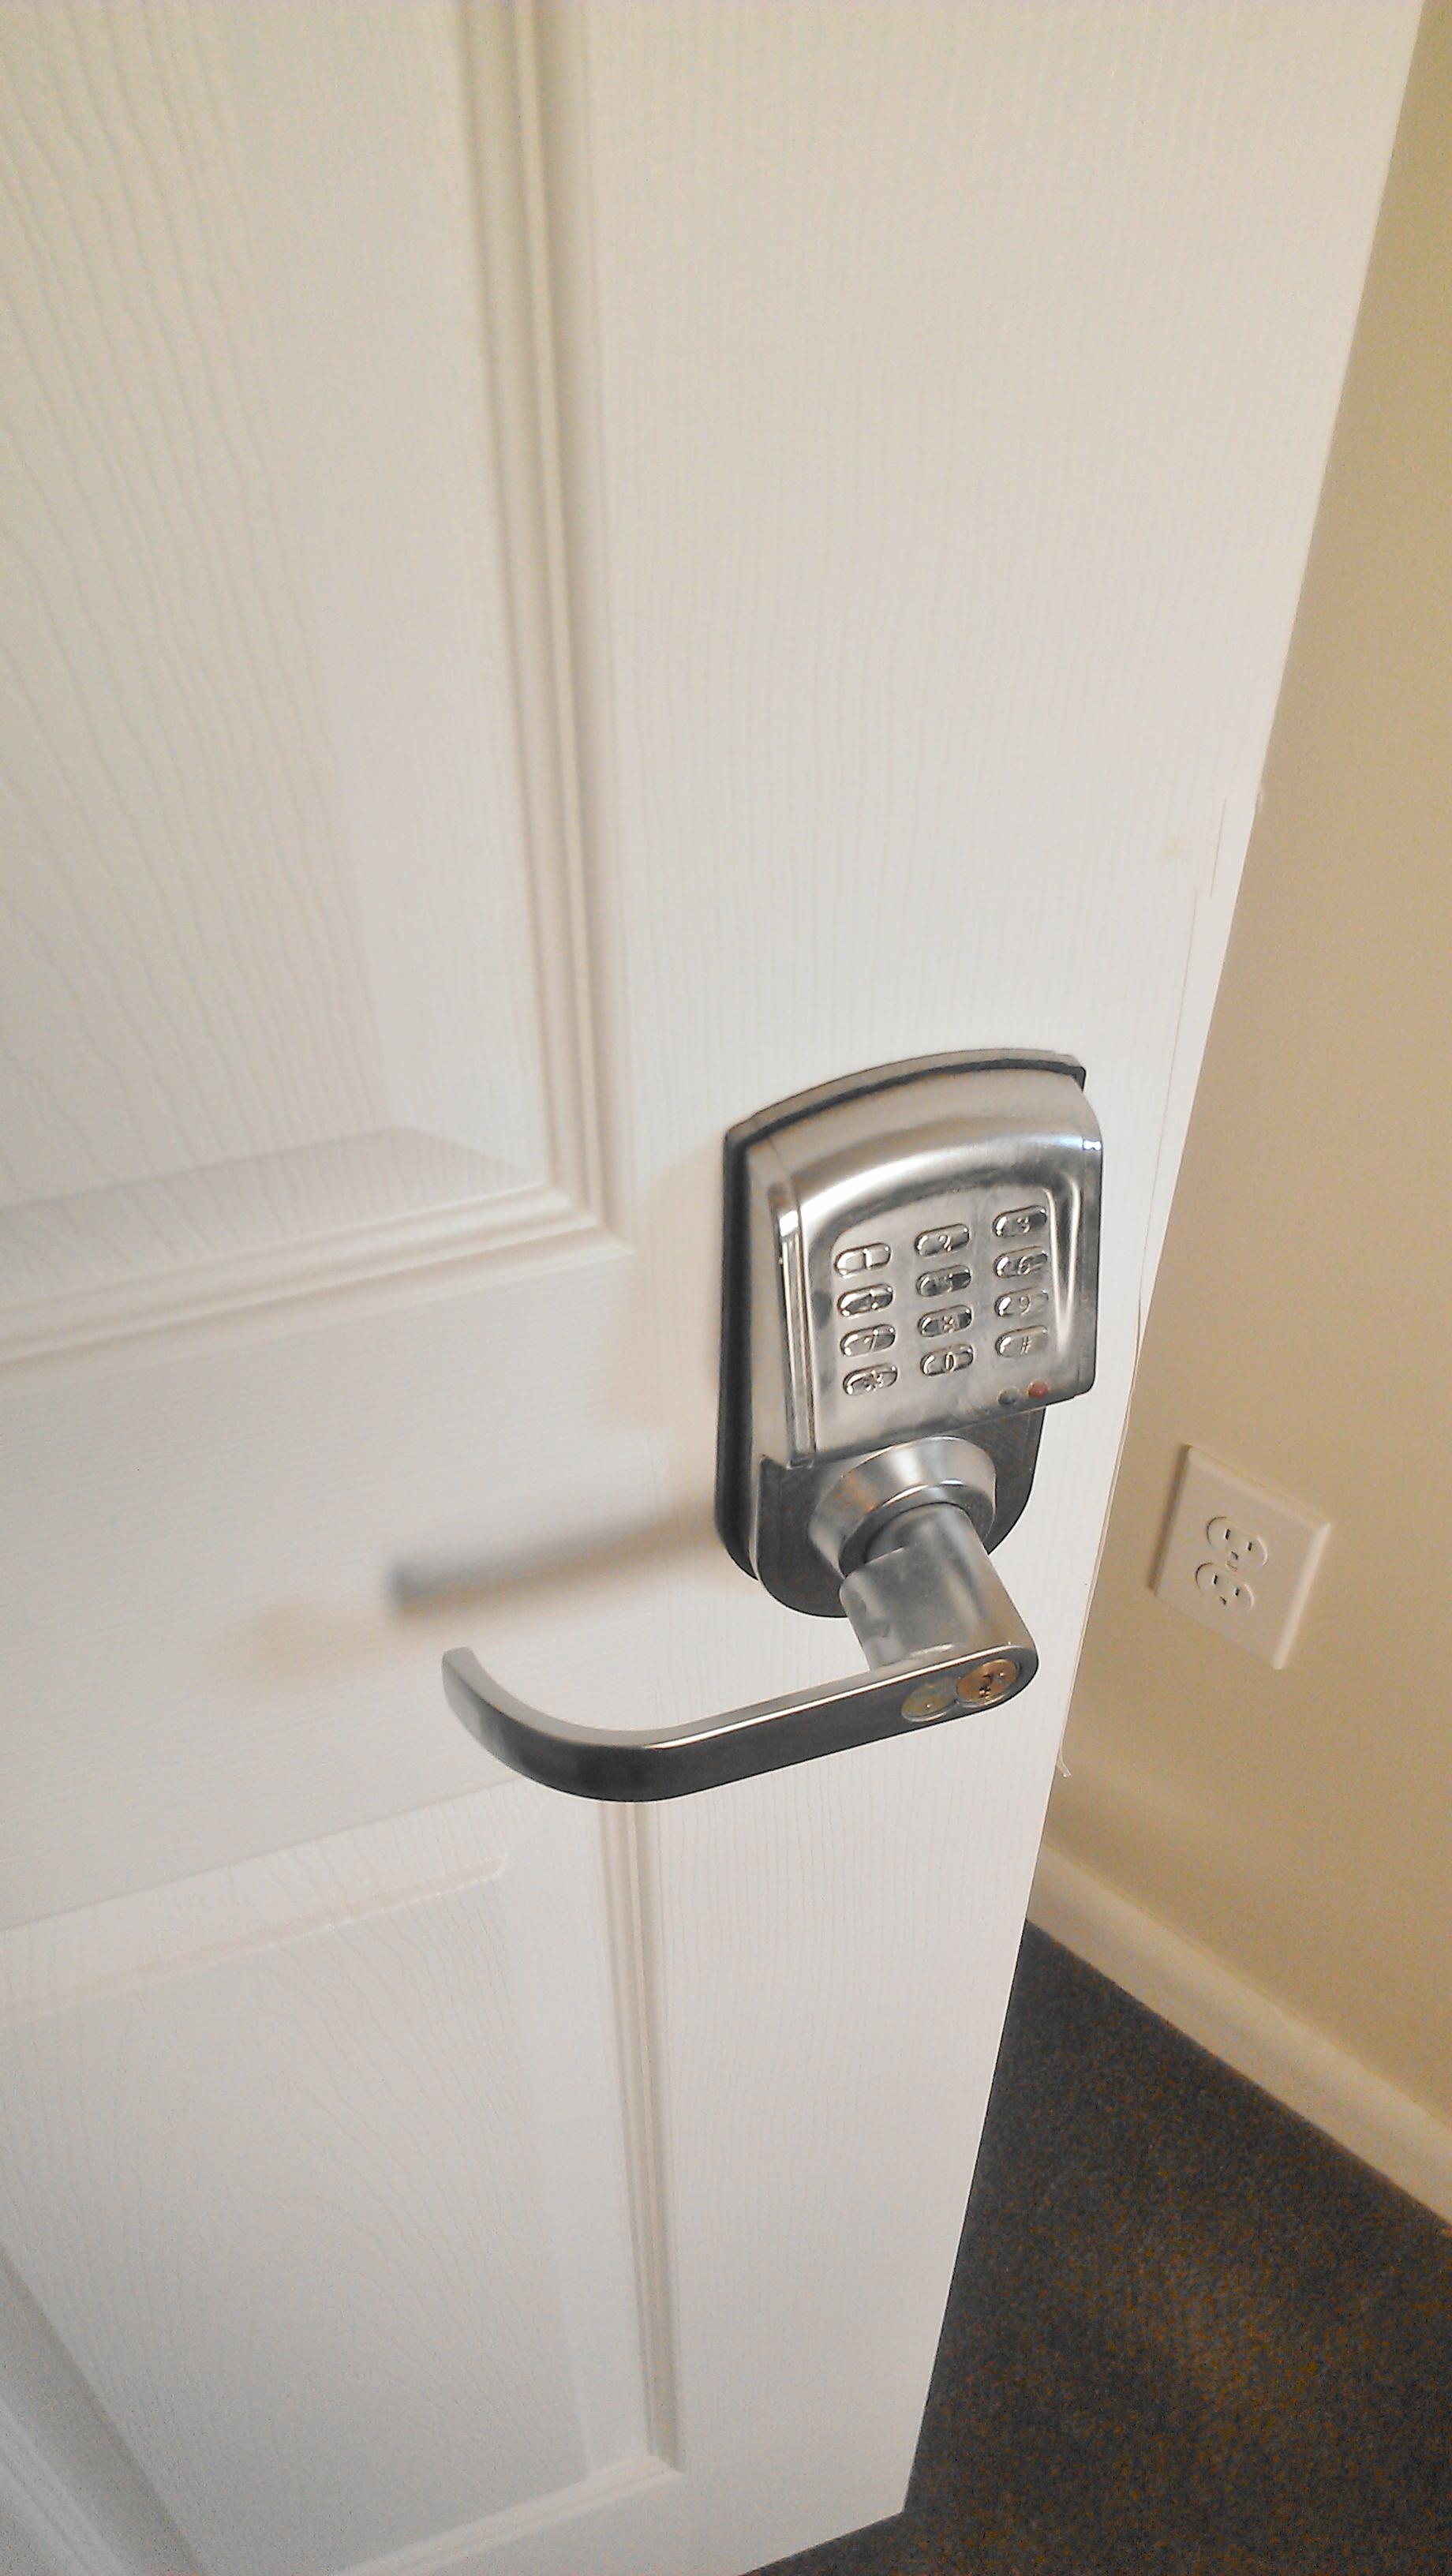 mirrored-sliding-closet-door-lock-photo-12